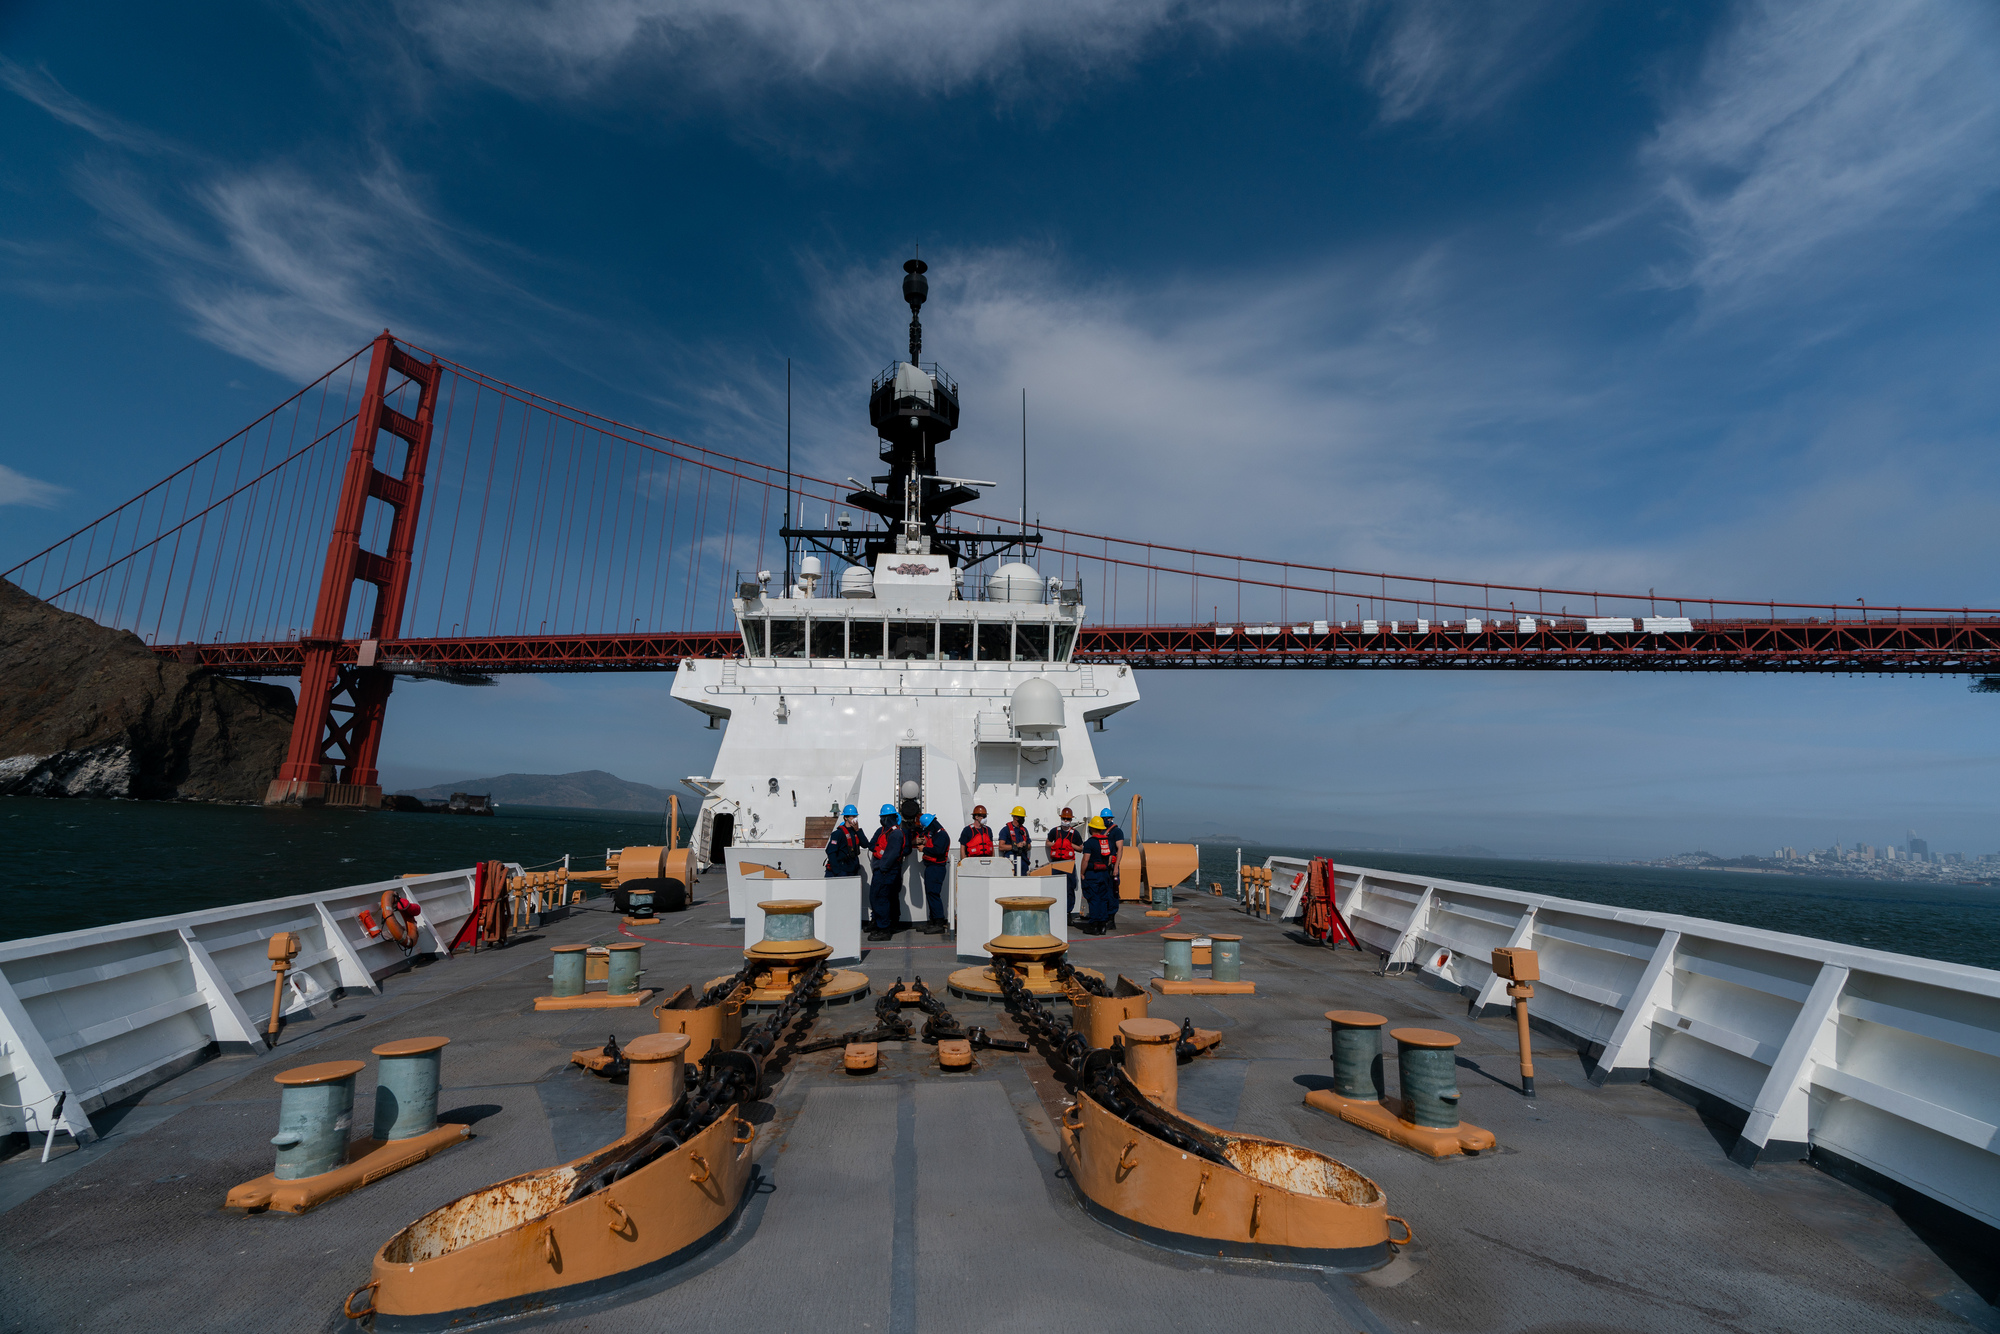 PHOTO: Alameda, California-based Coast Guard cutter departs for Western Pacific patrol